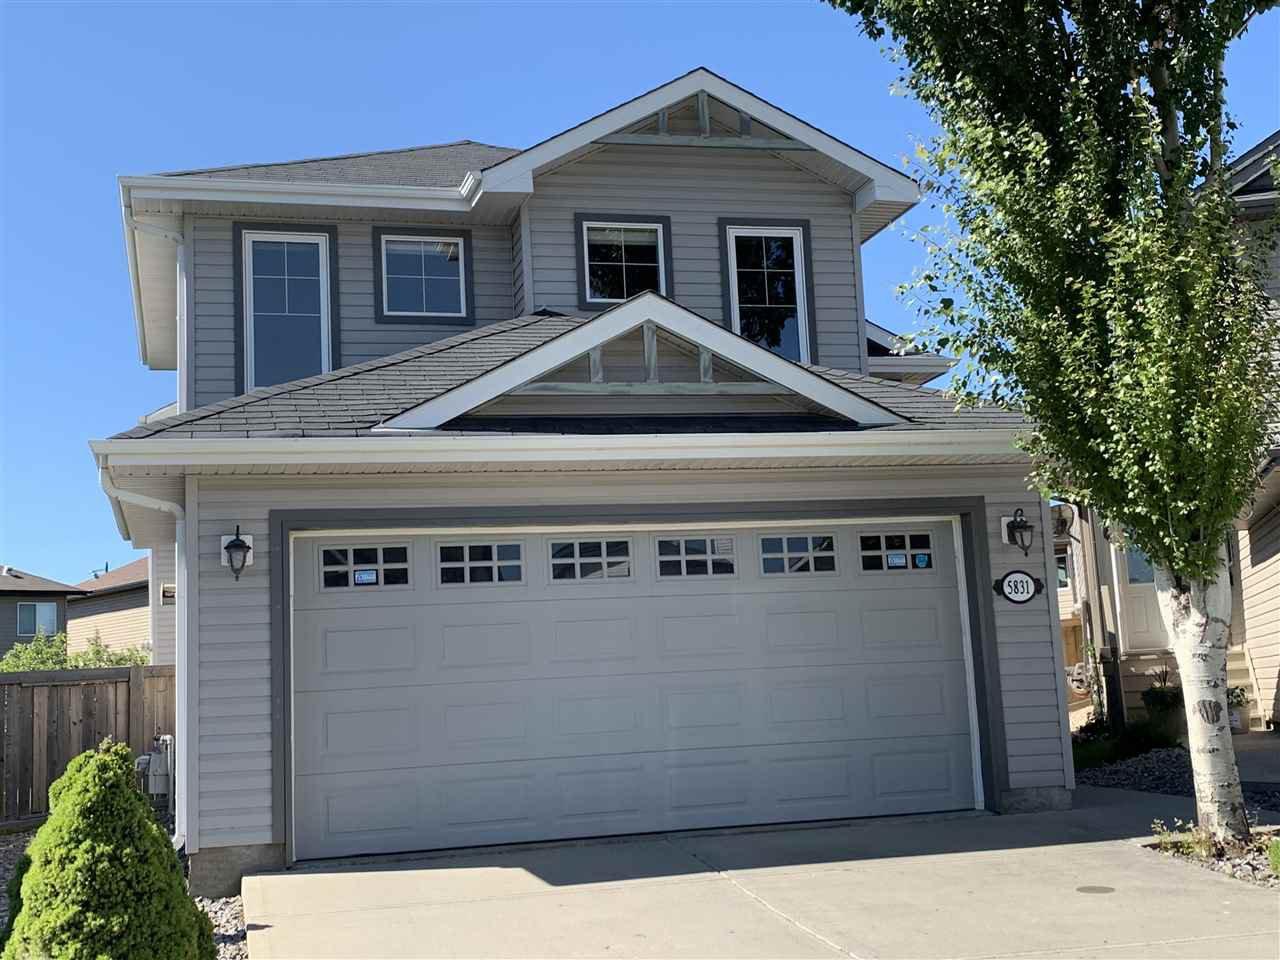 Main Photo: 5831 166 Avenue in Edmonton: Zone 03 House for sale : MLS®# E4217769